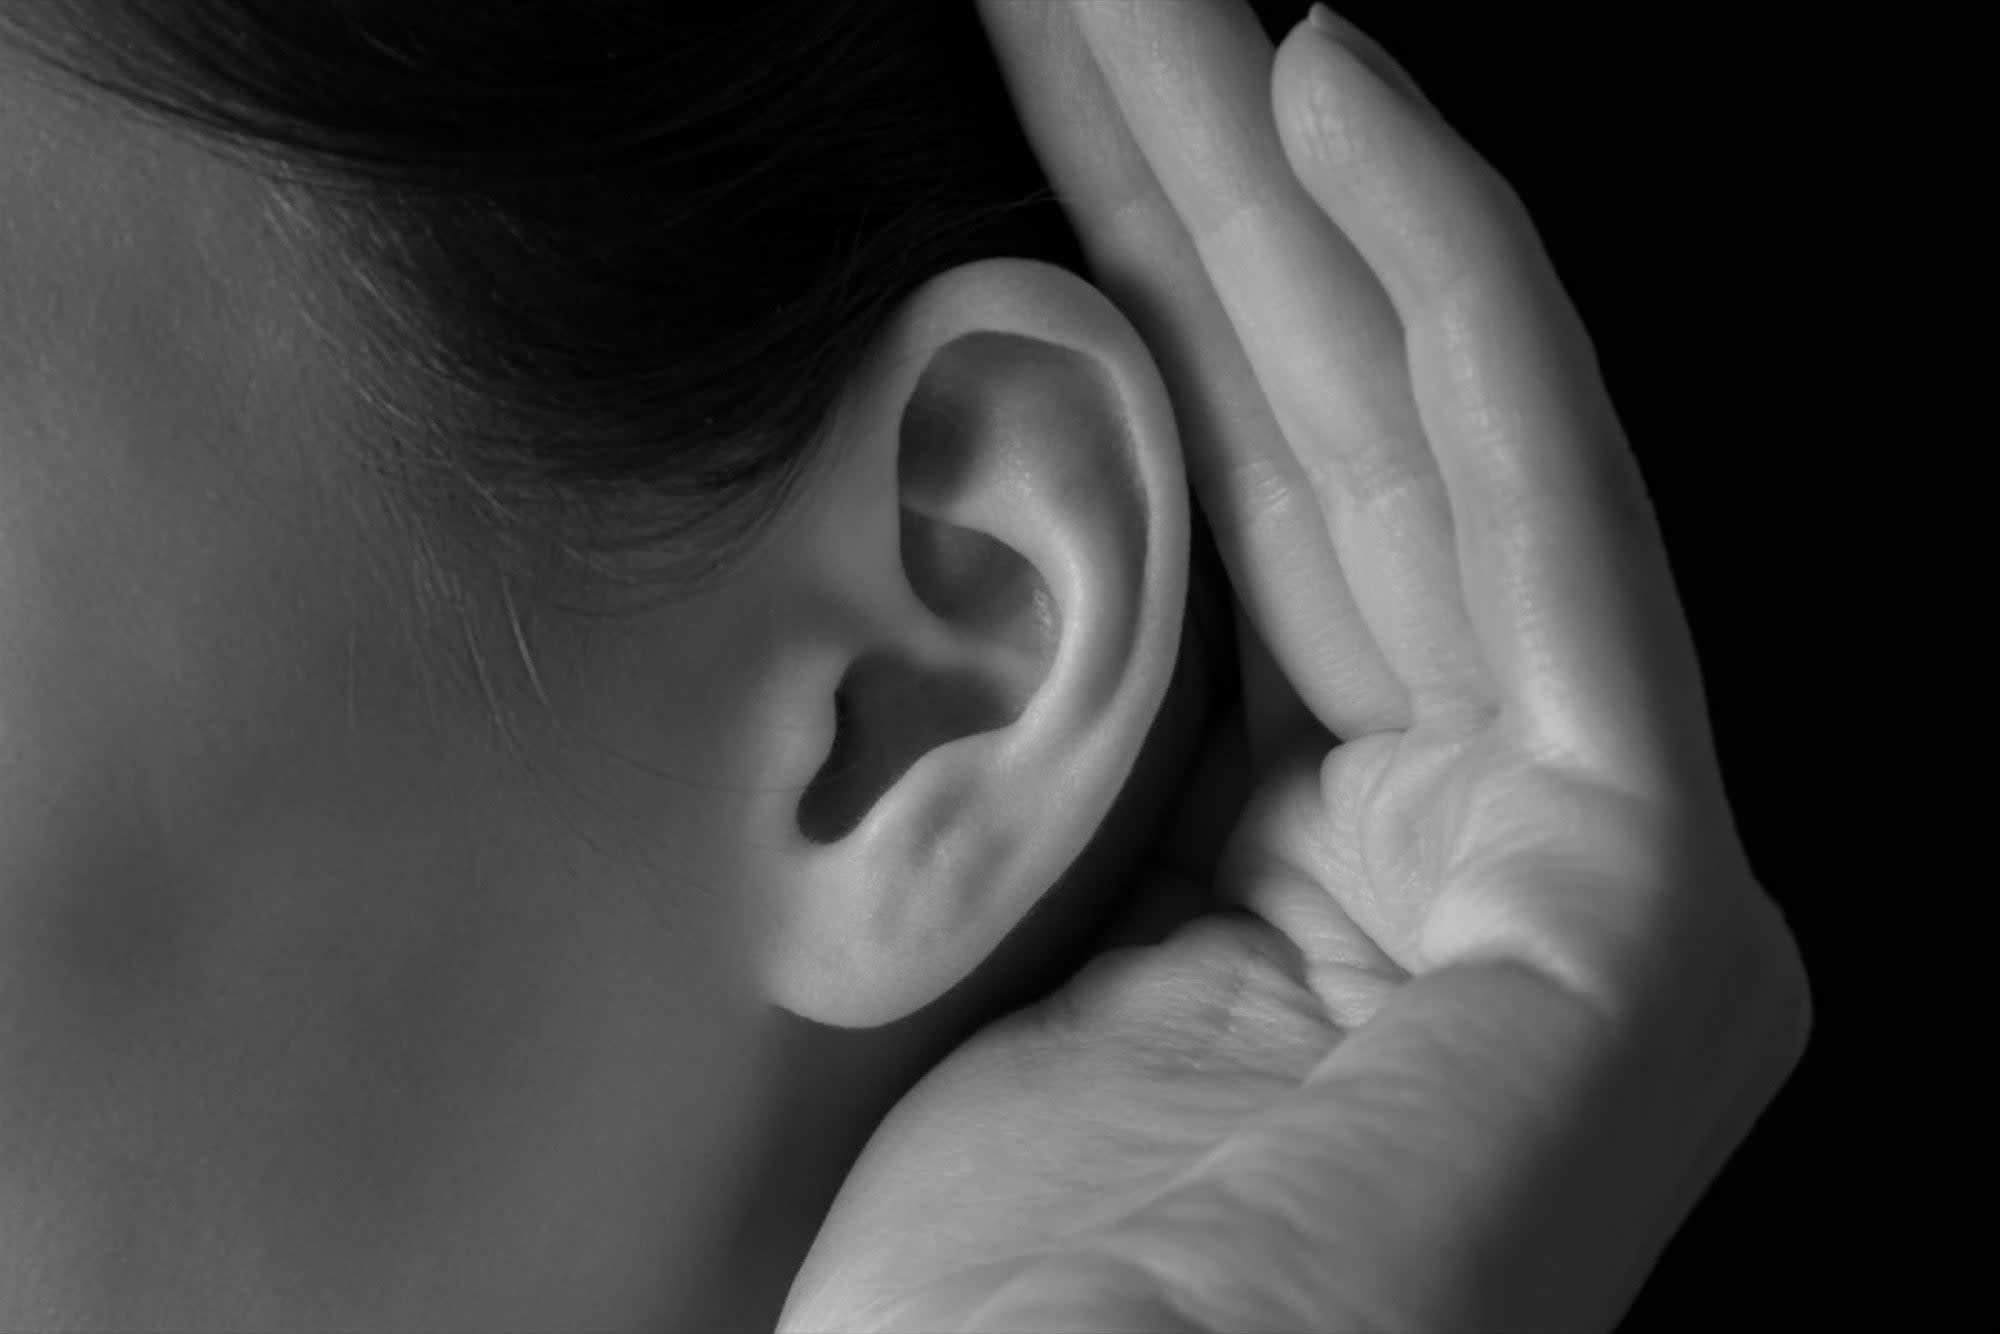 казахстане рука у уха картинка длинная